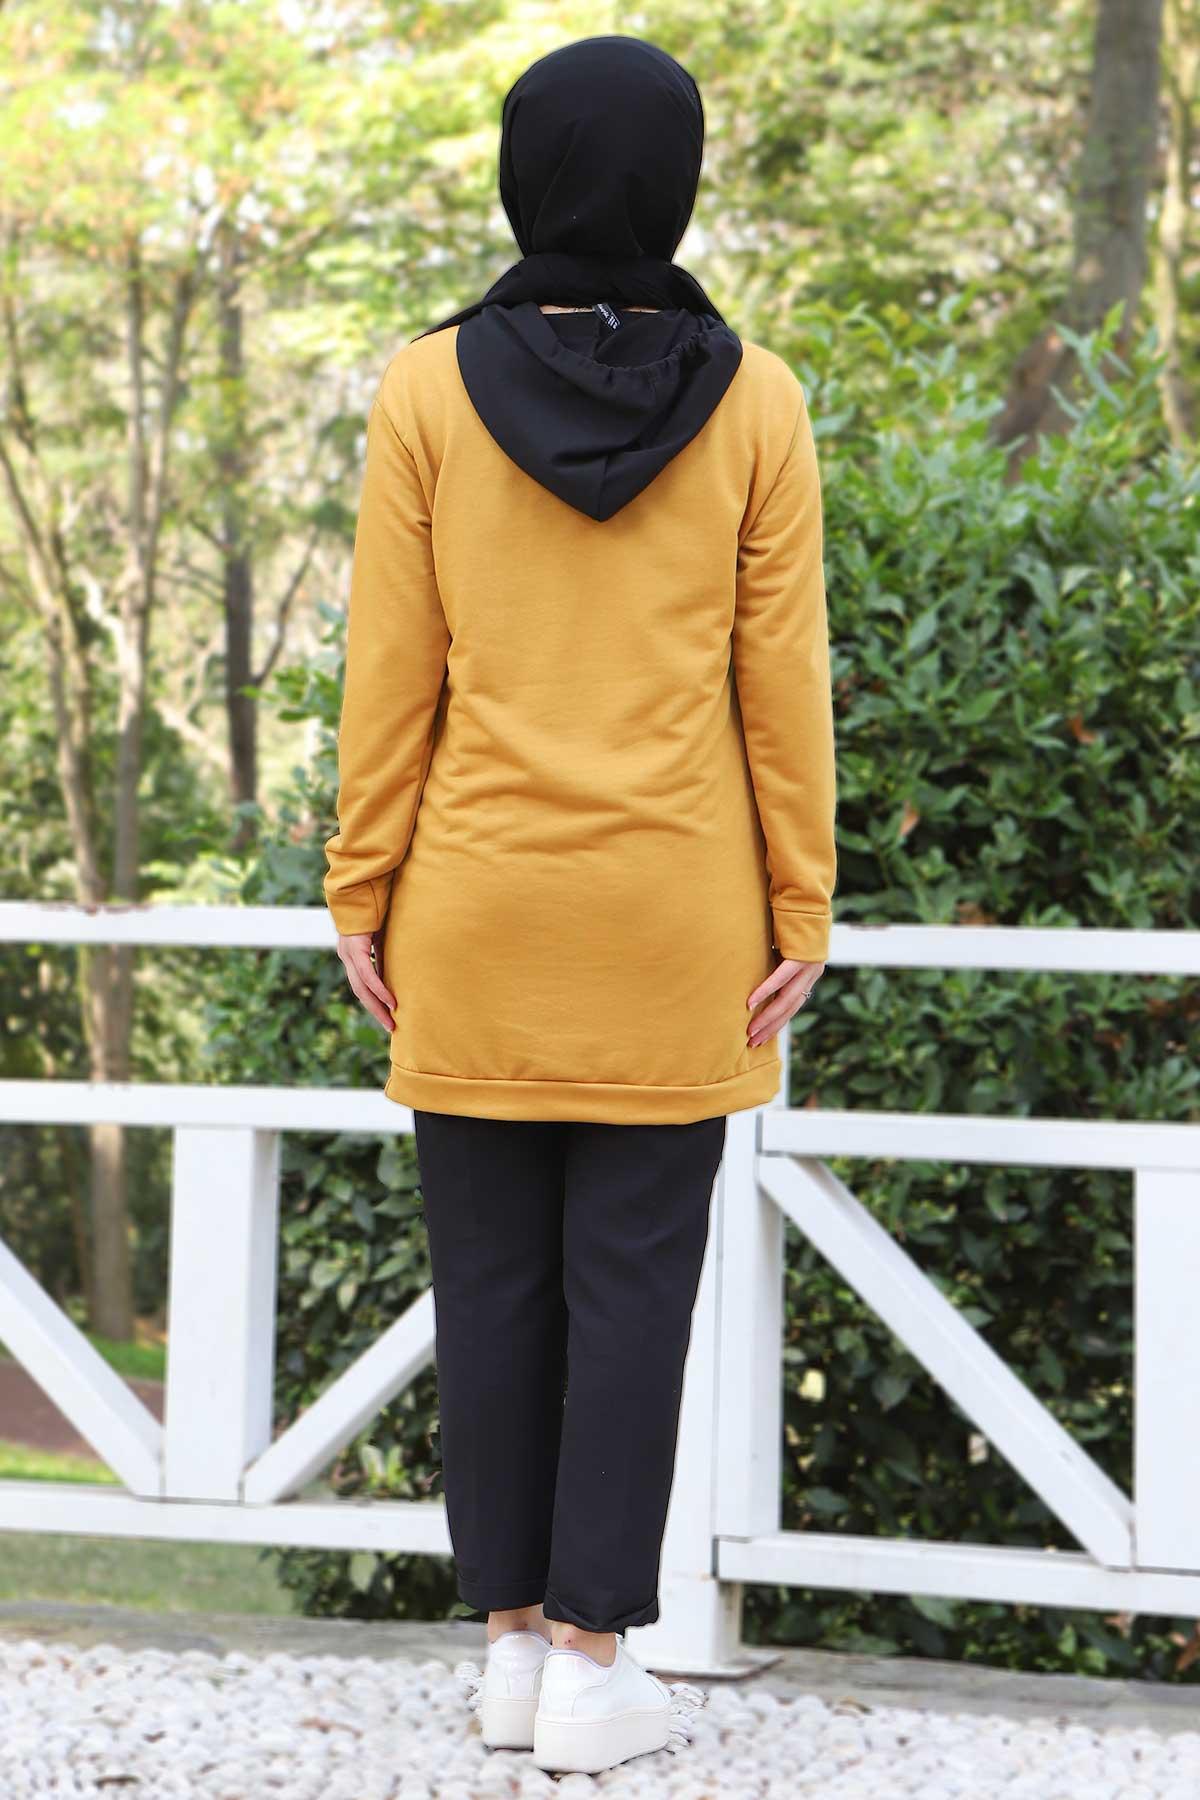 Kanguru Cepli Sweatshirt TSD3320 Hardal